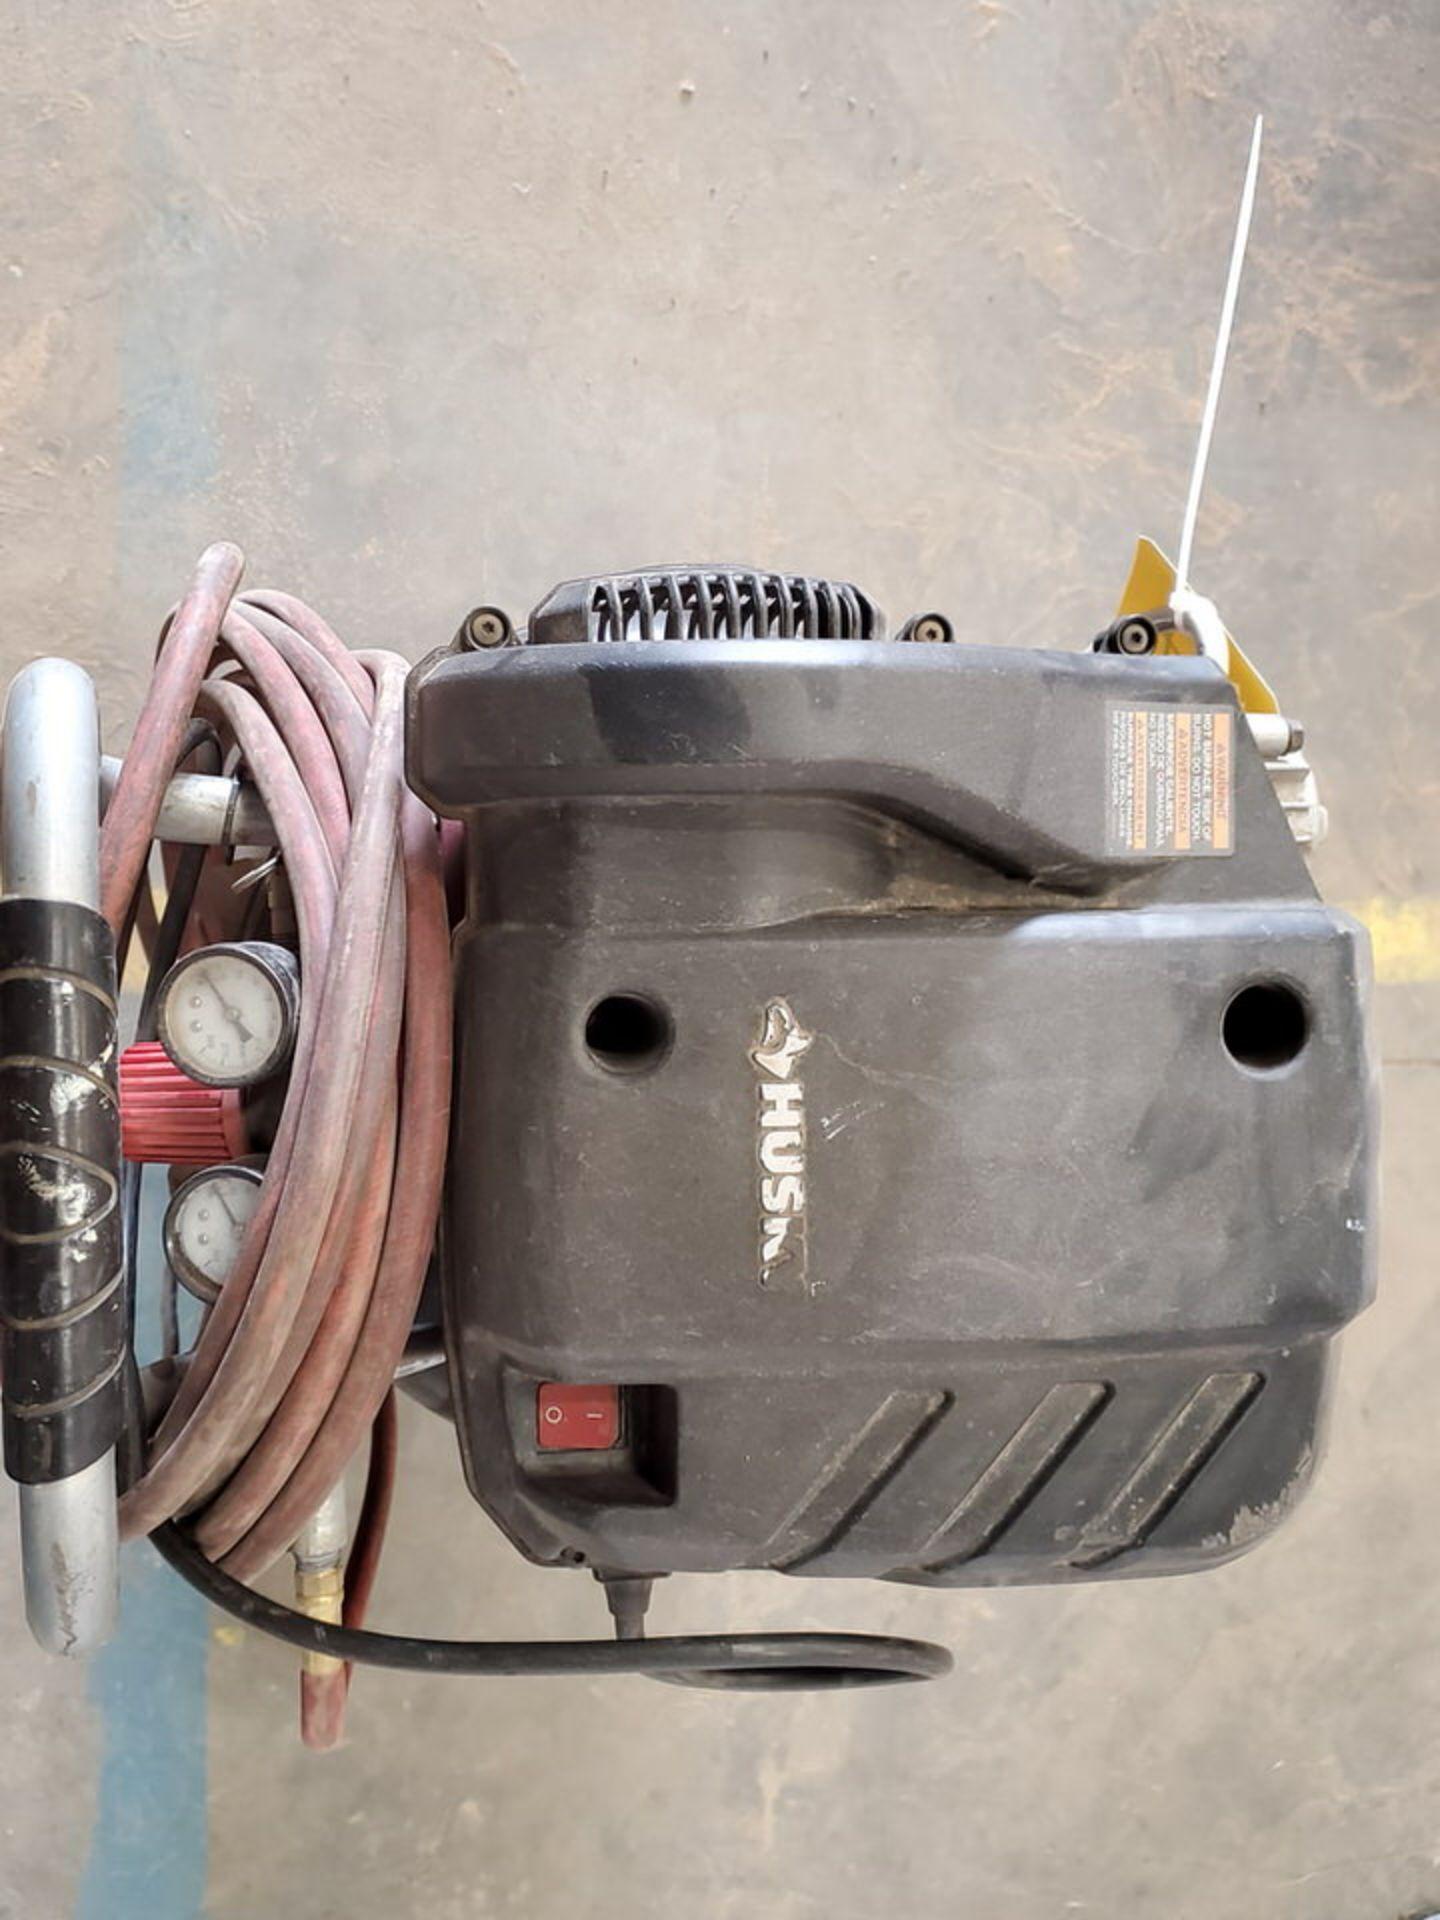 Husky C201H Portable Air Compressor 175psi - Image 4 of 5